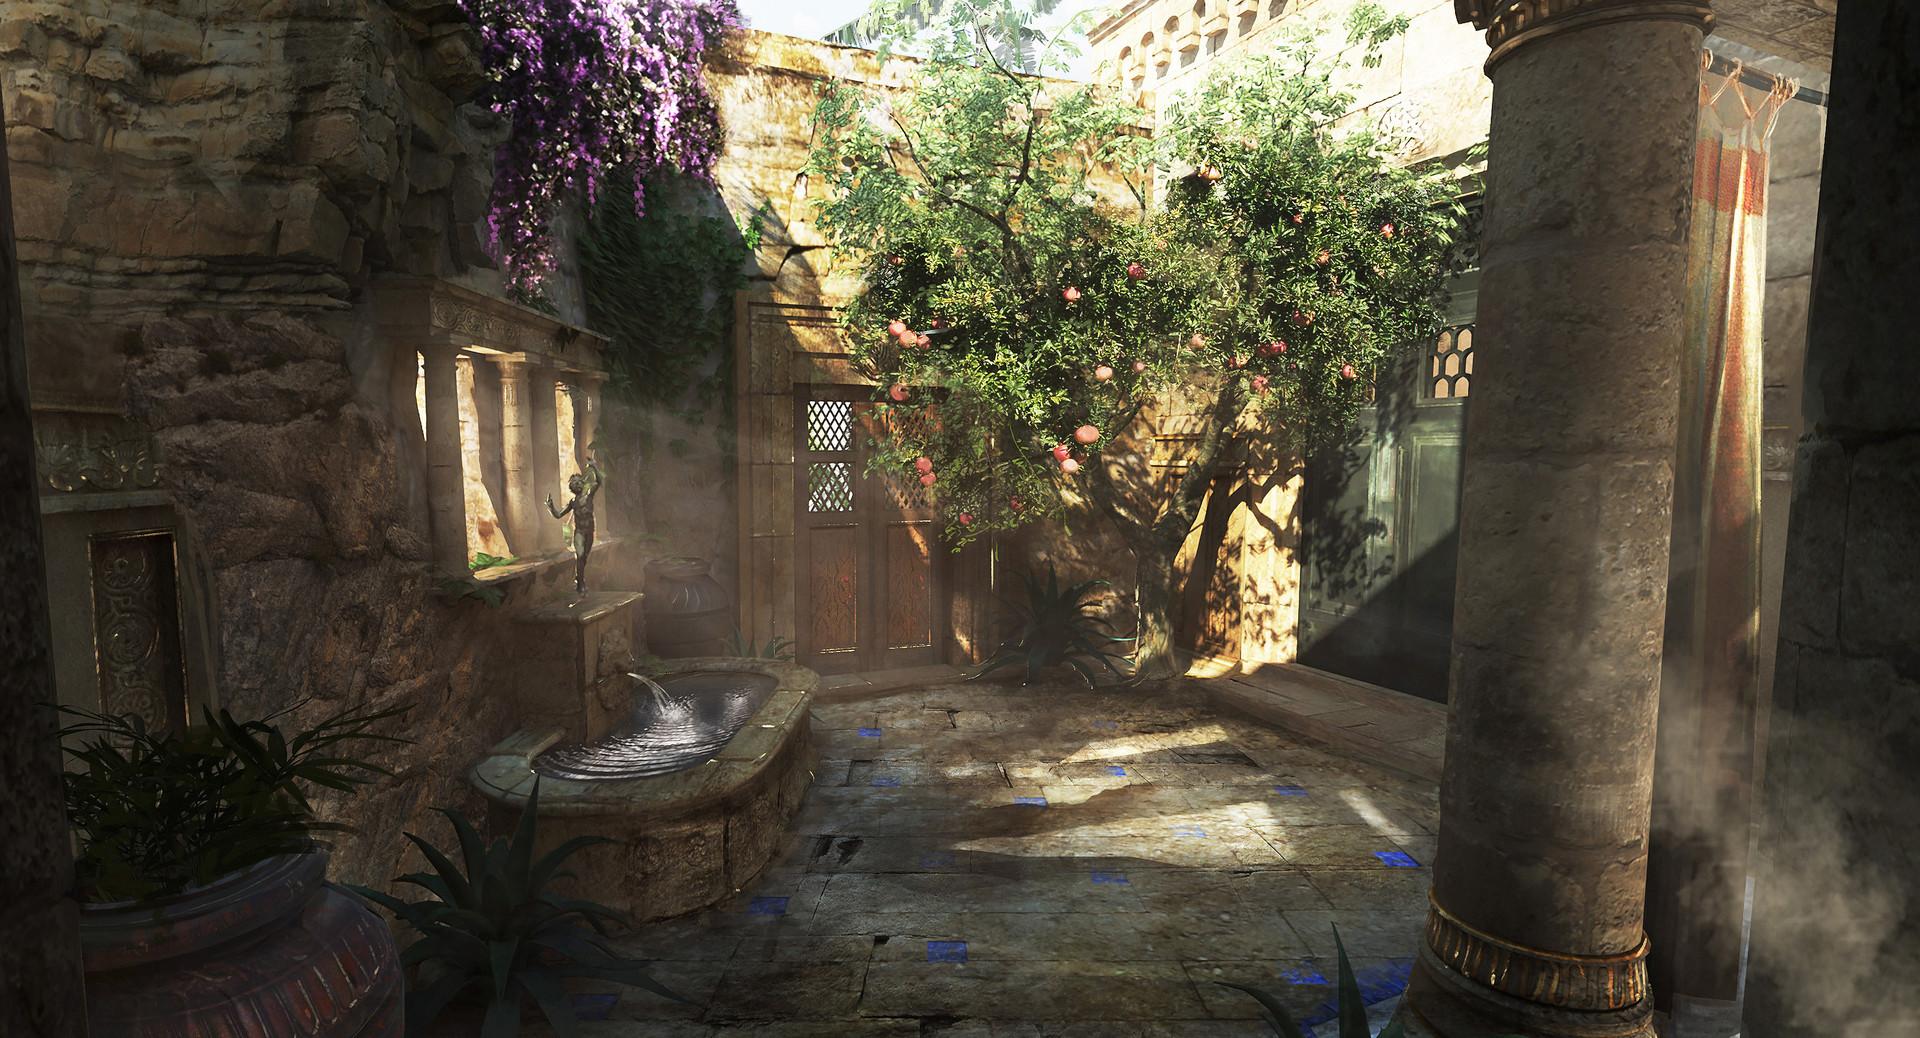 Armando savoia giardino 1